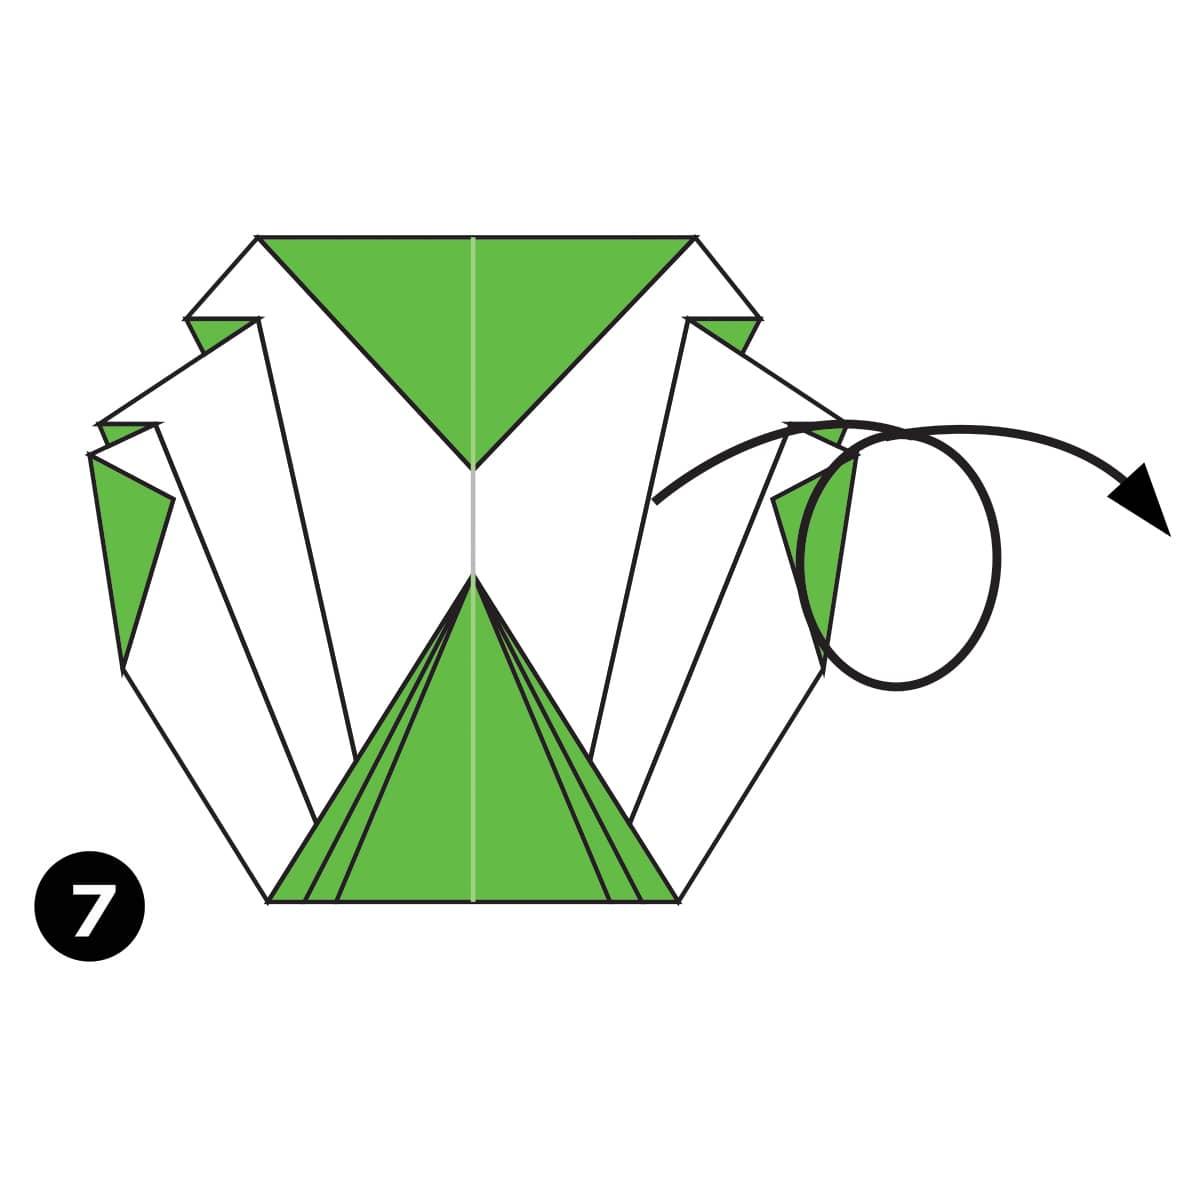 Cabbage Step 7